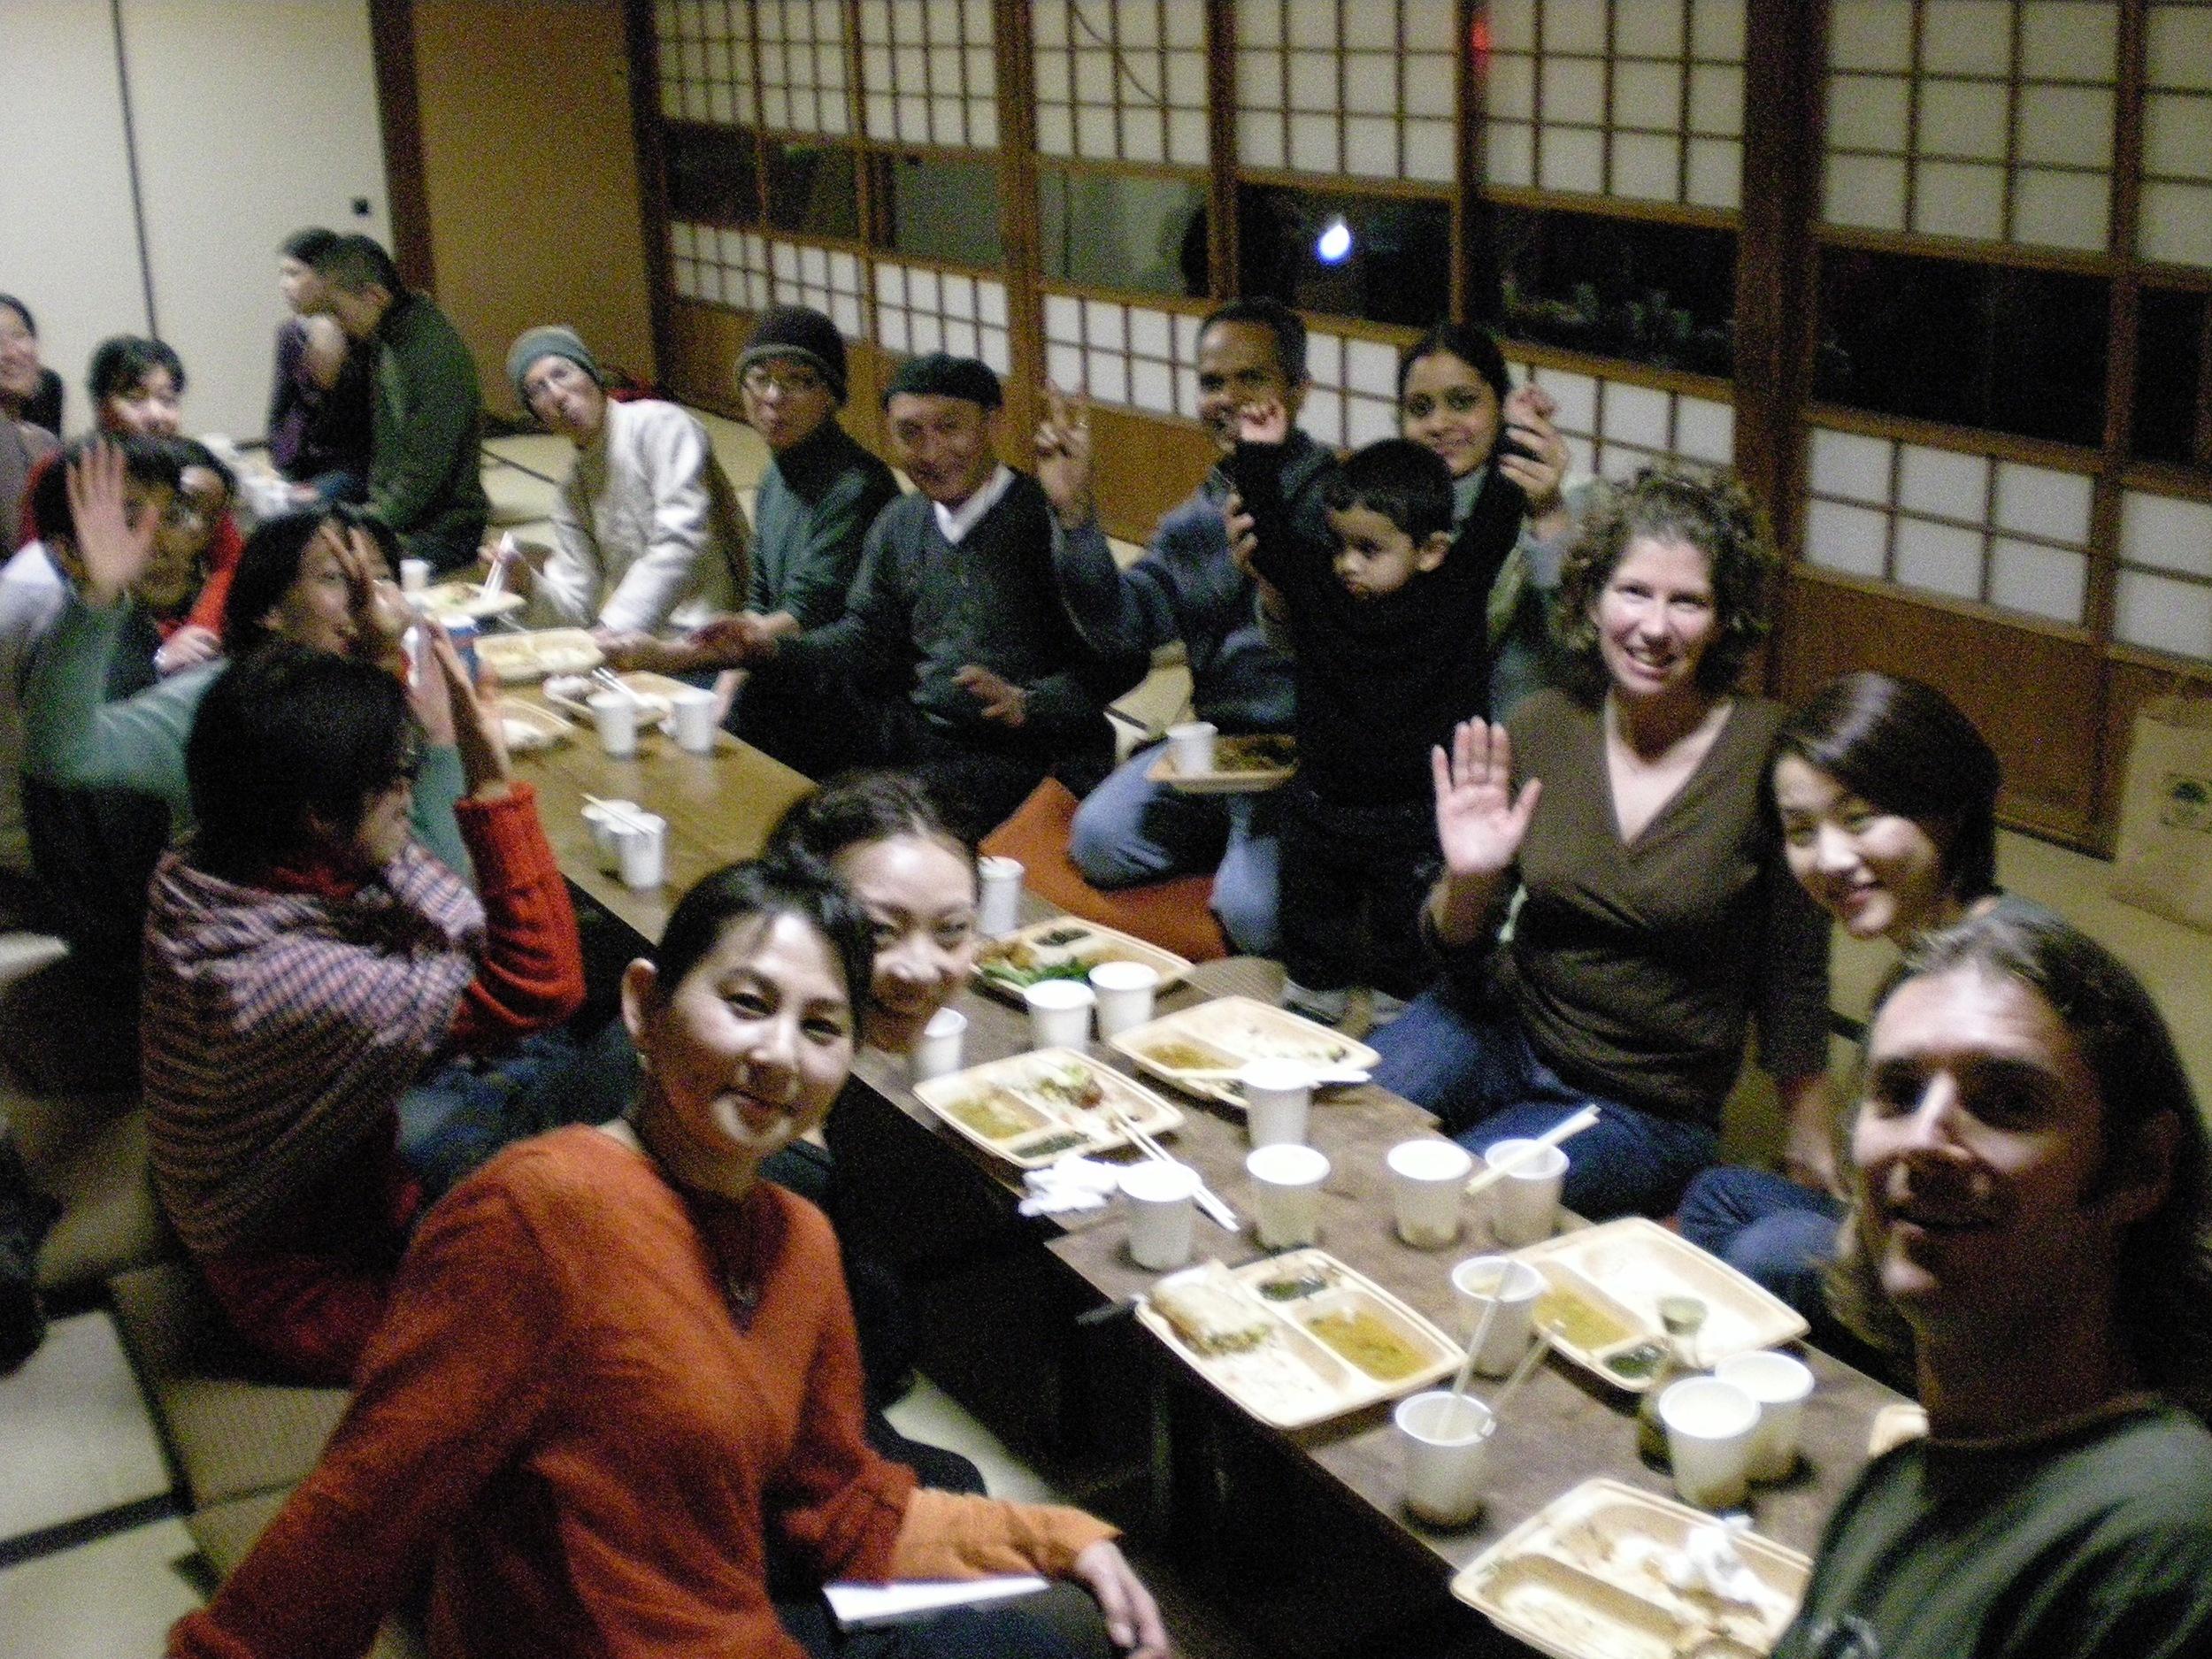 After kirtan dinner, Kamakura, Japan